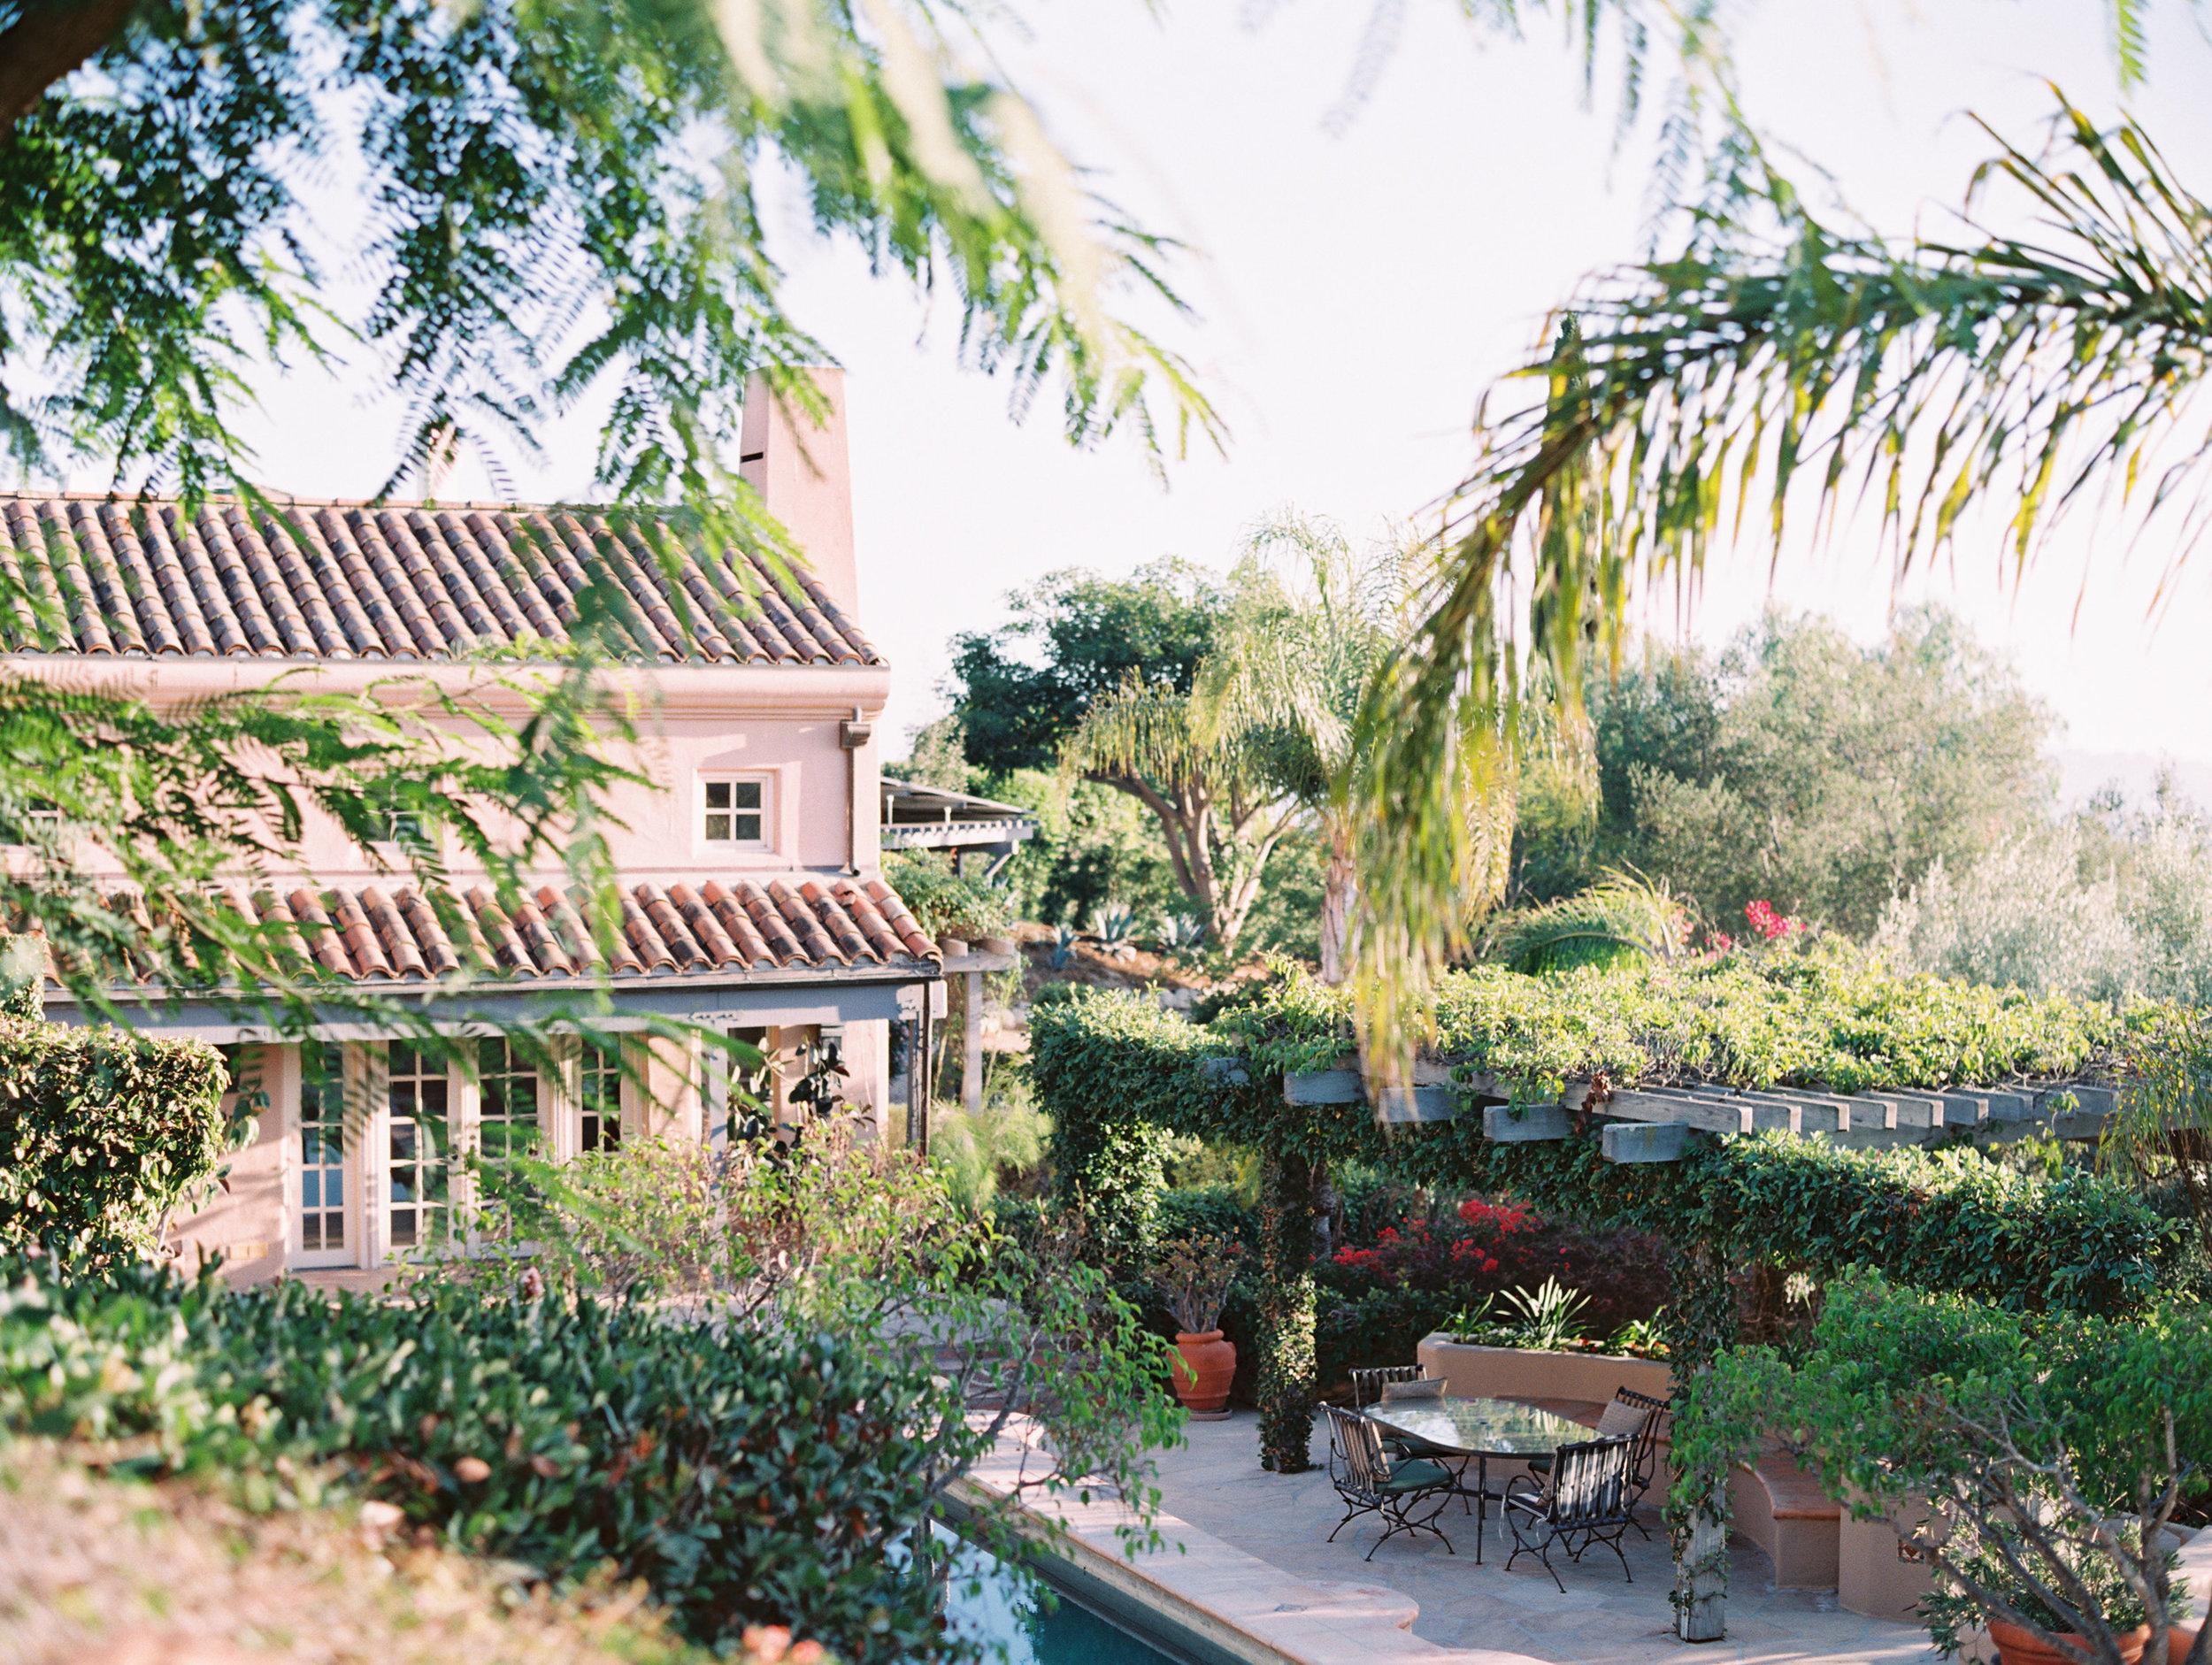 santa-barbara-elopement-wedding-planner-planning-coordinator-coordination-event-design-villa-verano-estate-riviera-garden-olive-tree-asian-day-of-palm-tree (2).jpg